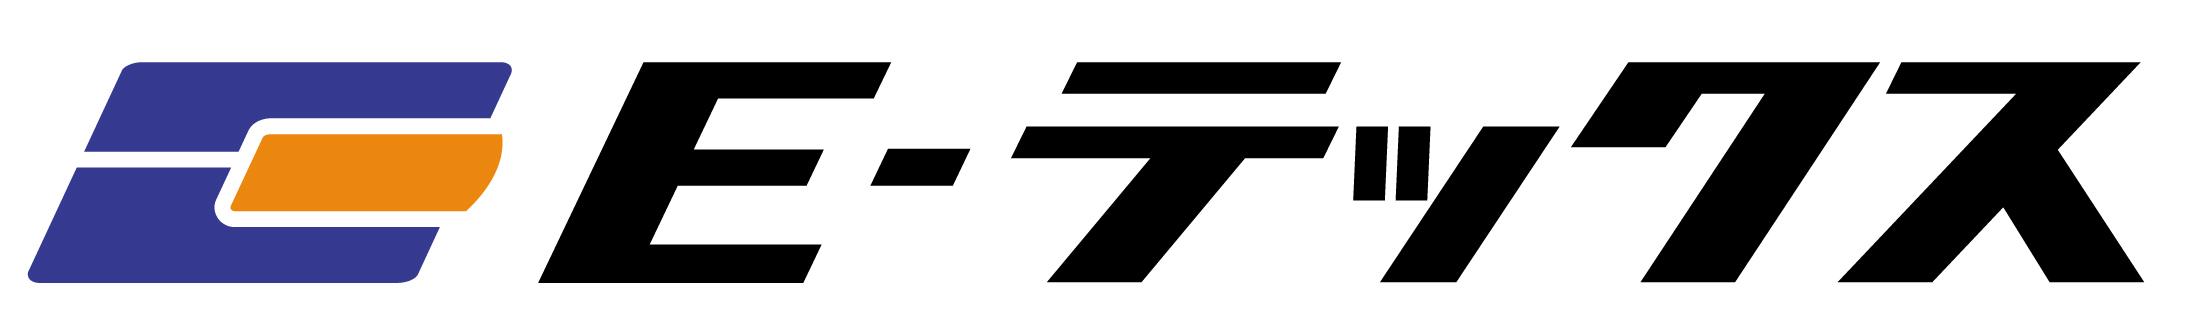 Eテックス|京都府城陽市・宇治市の太陽光・蓄電池・オール電化工事店